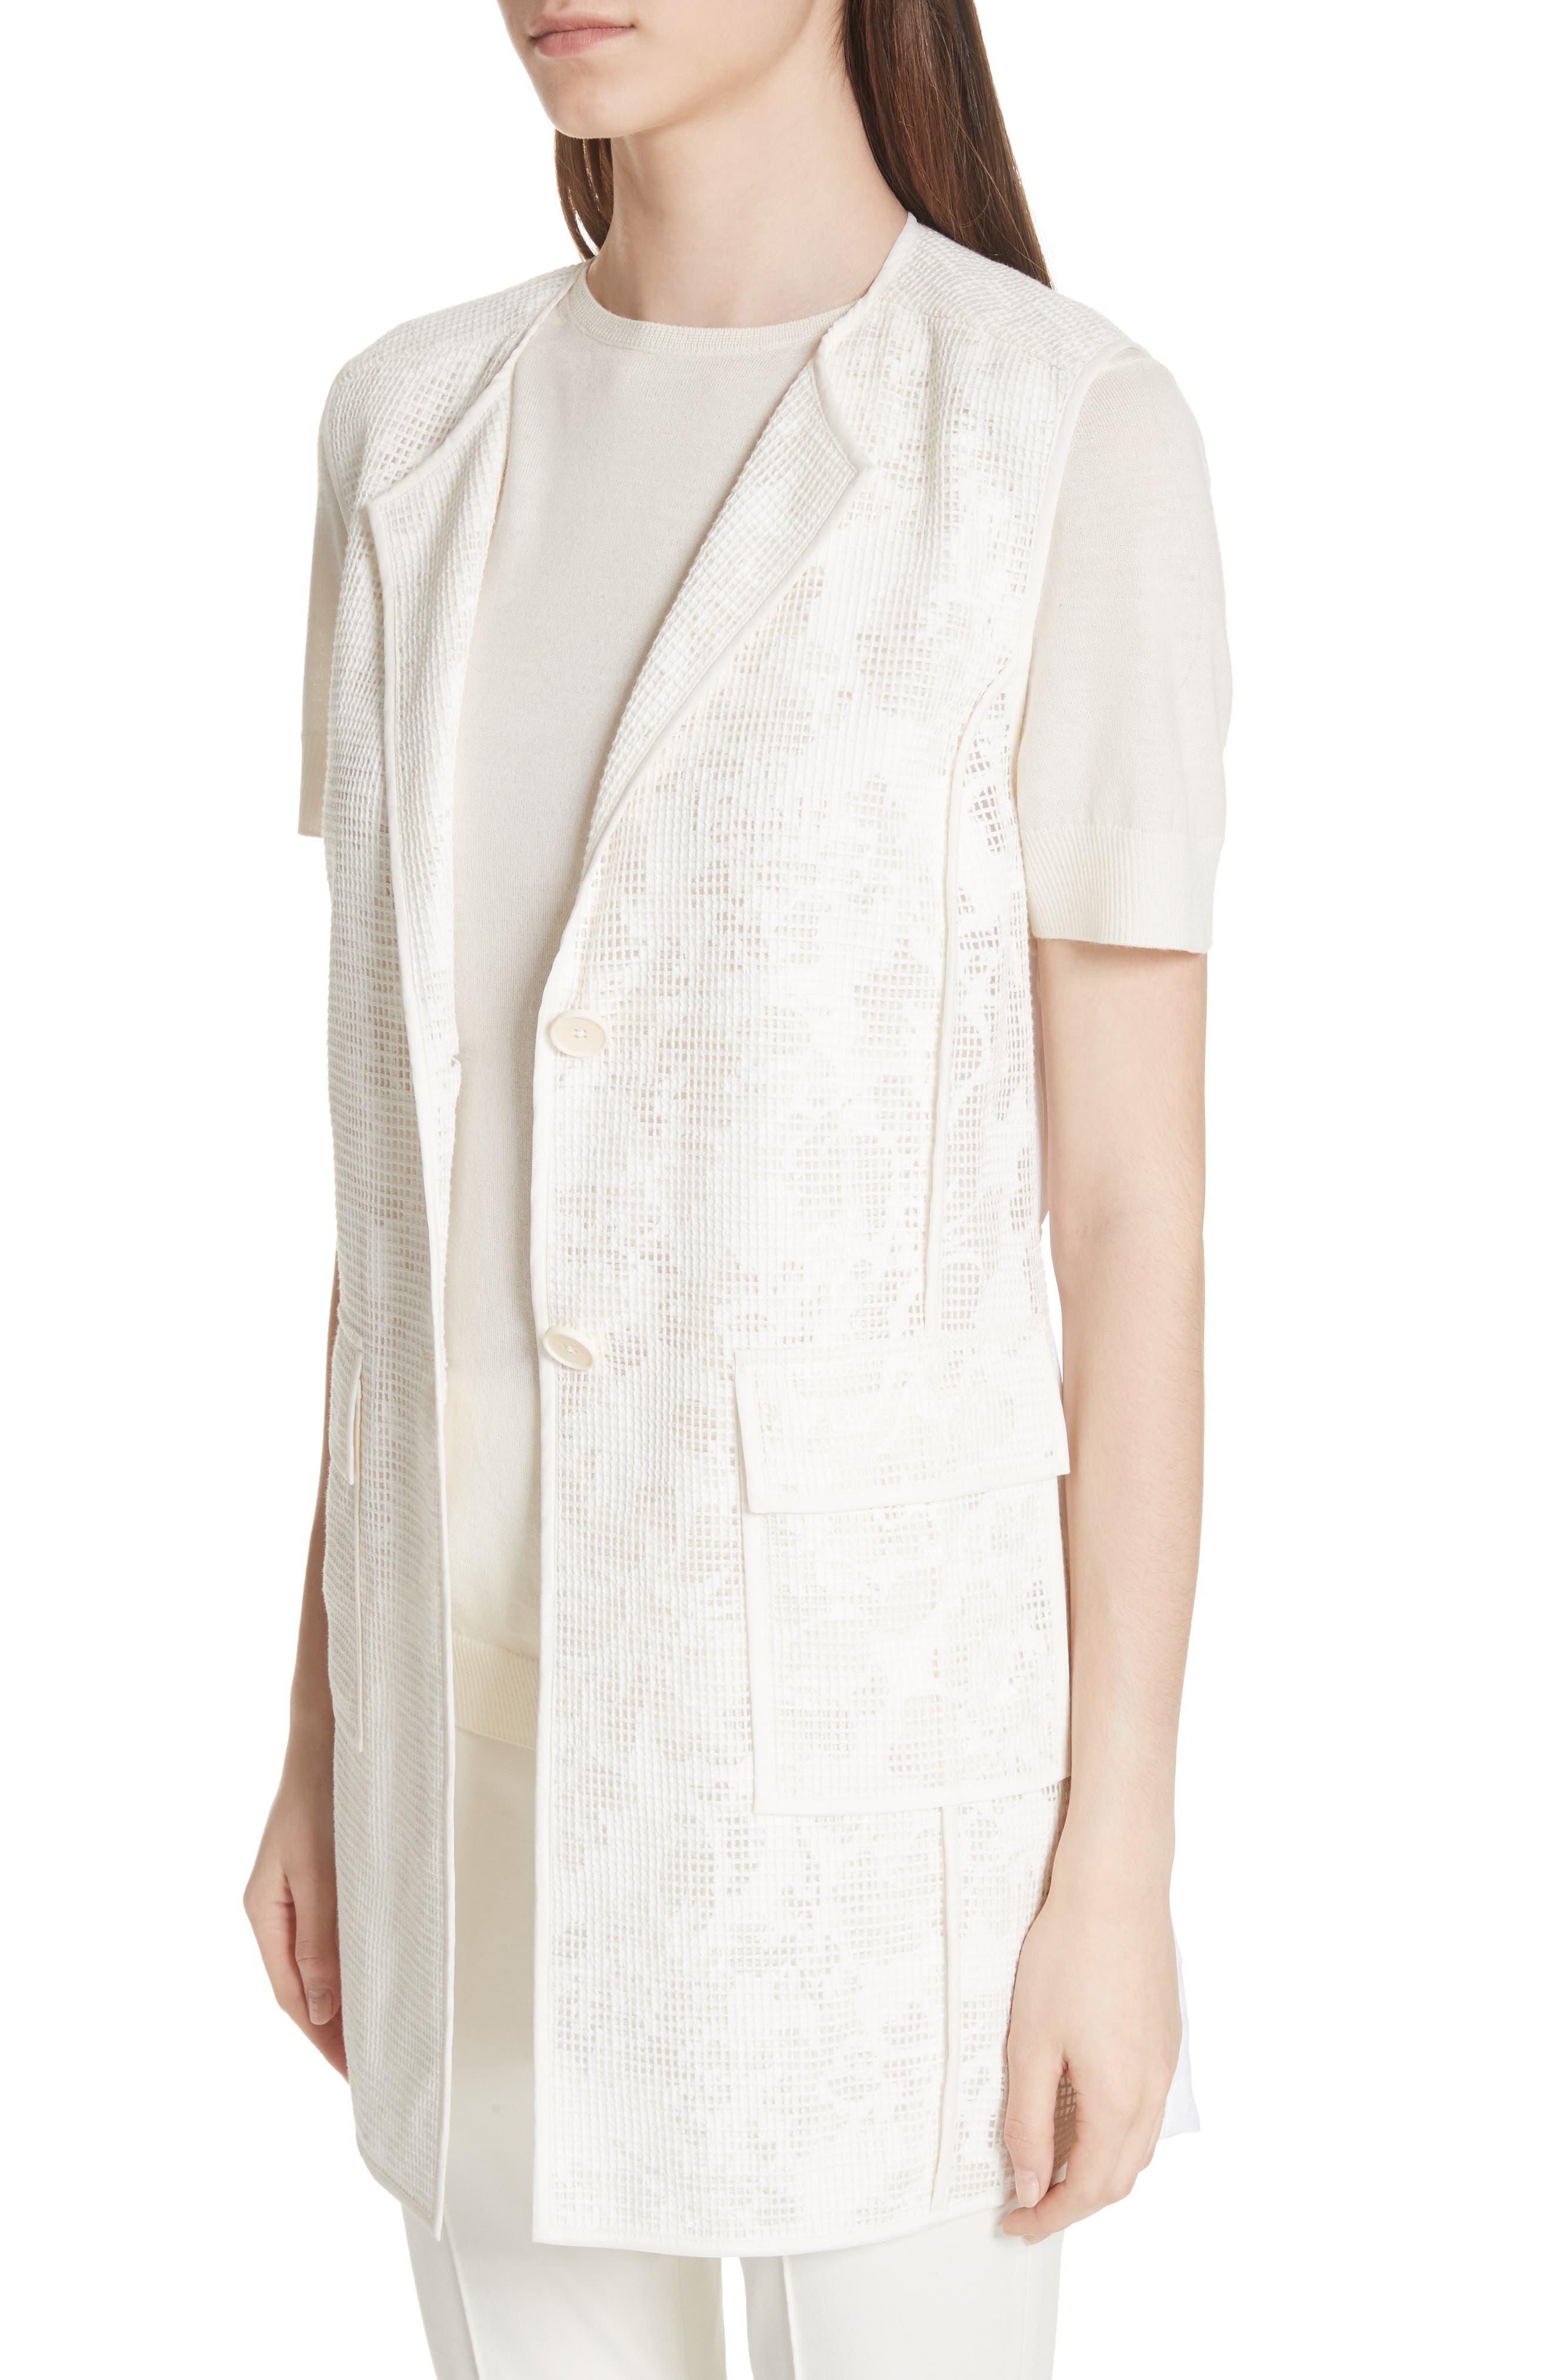 Burnout Netting Vest,                             Alternate thumbnail 4, color,                             CREAM/ BIANCO